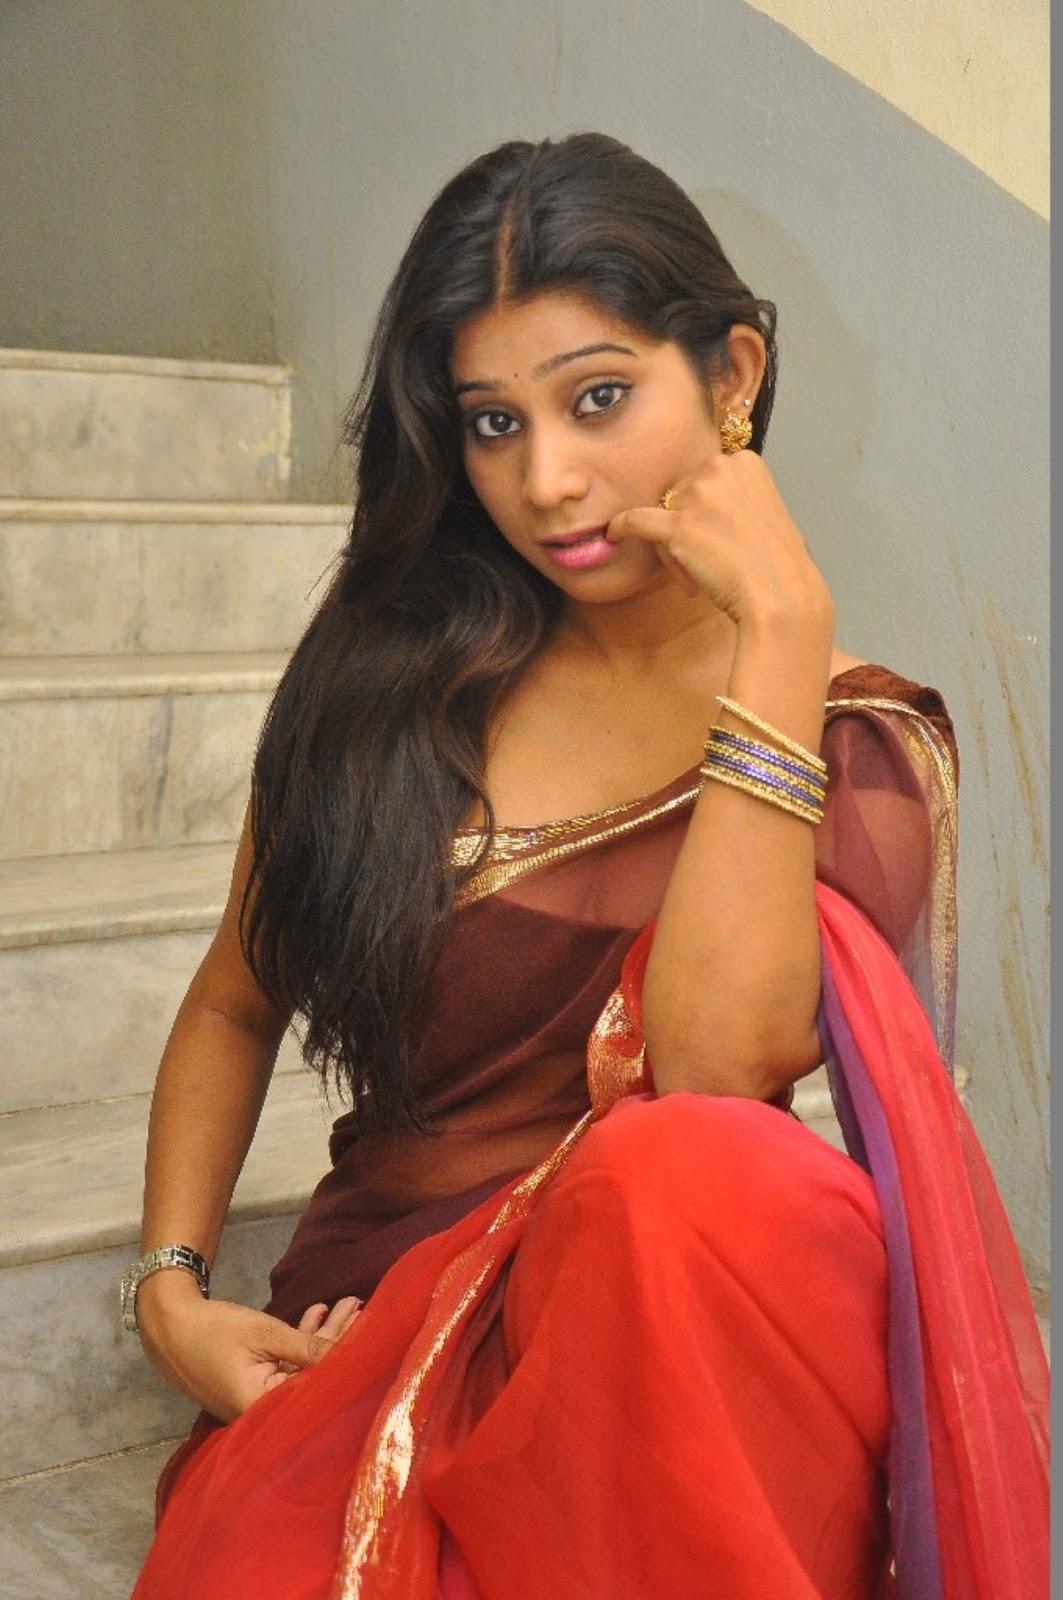 Midhuna Waliya Hot Cleavage Show Photos in Transparent